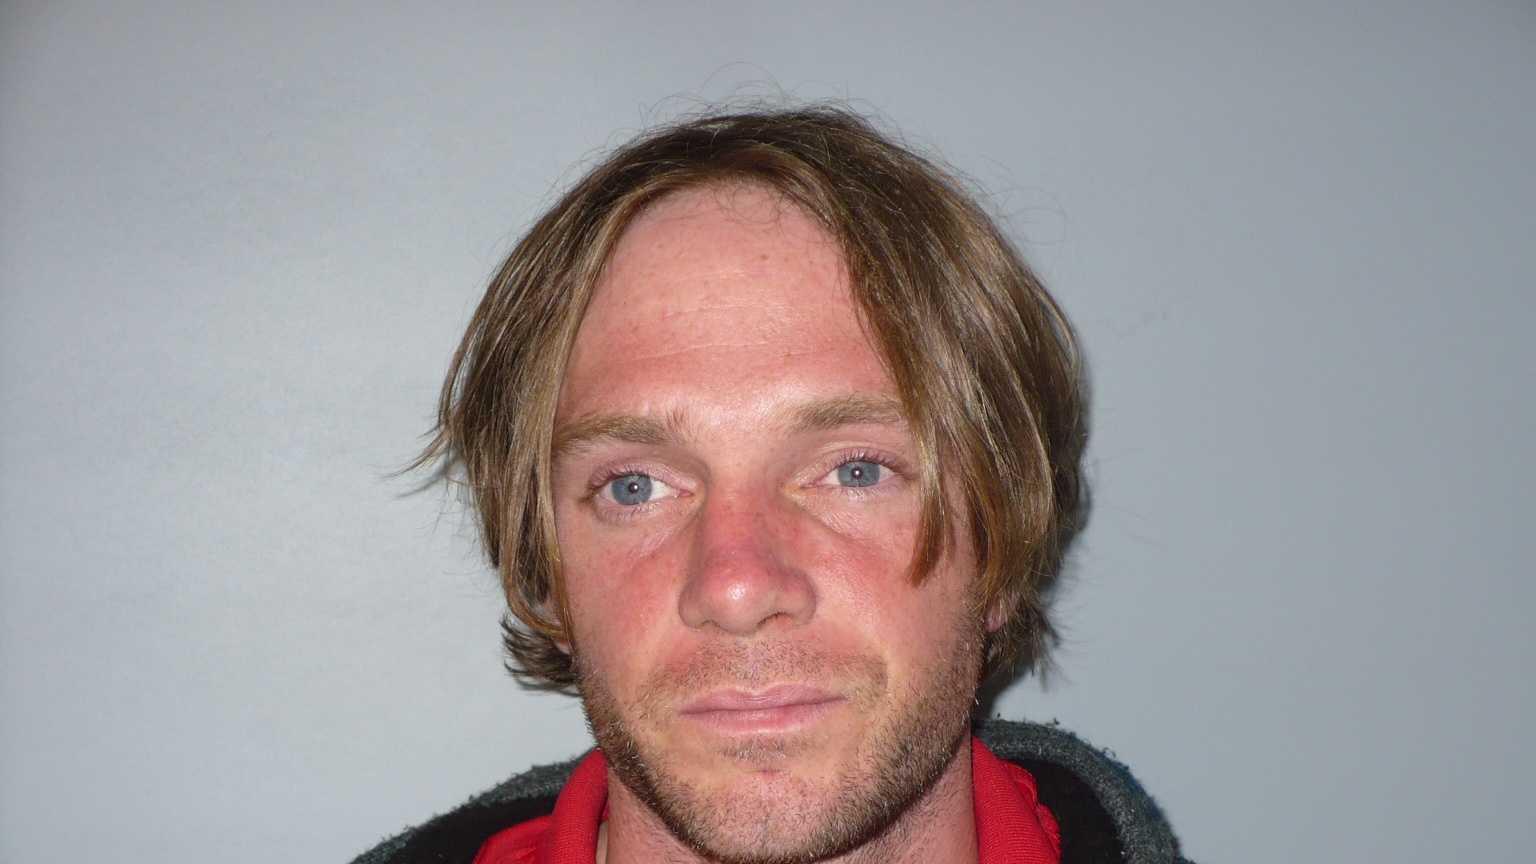 Police mug shot of alleged heroin dealer Jason Schofield